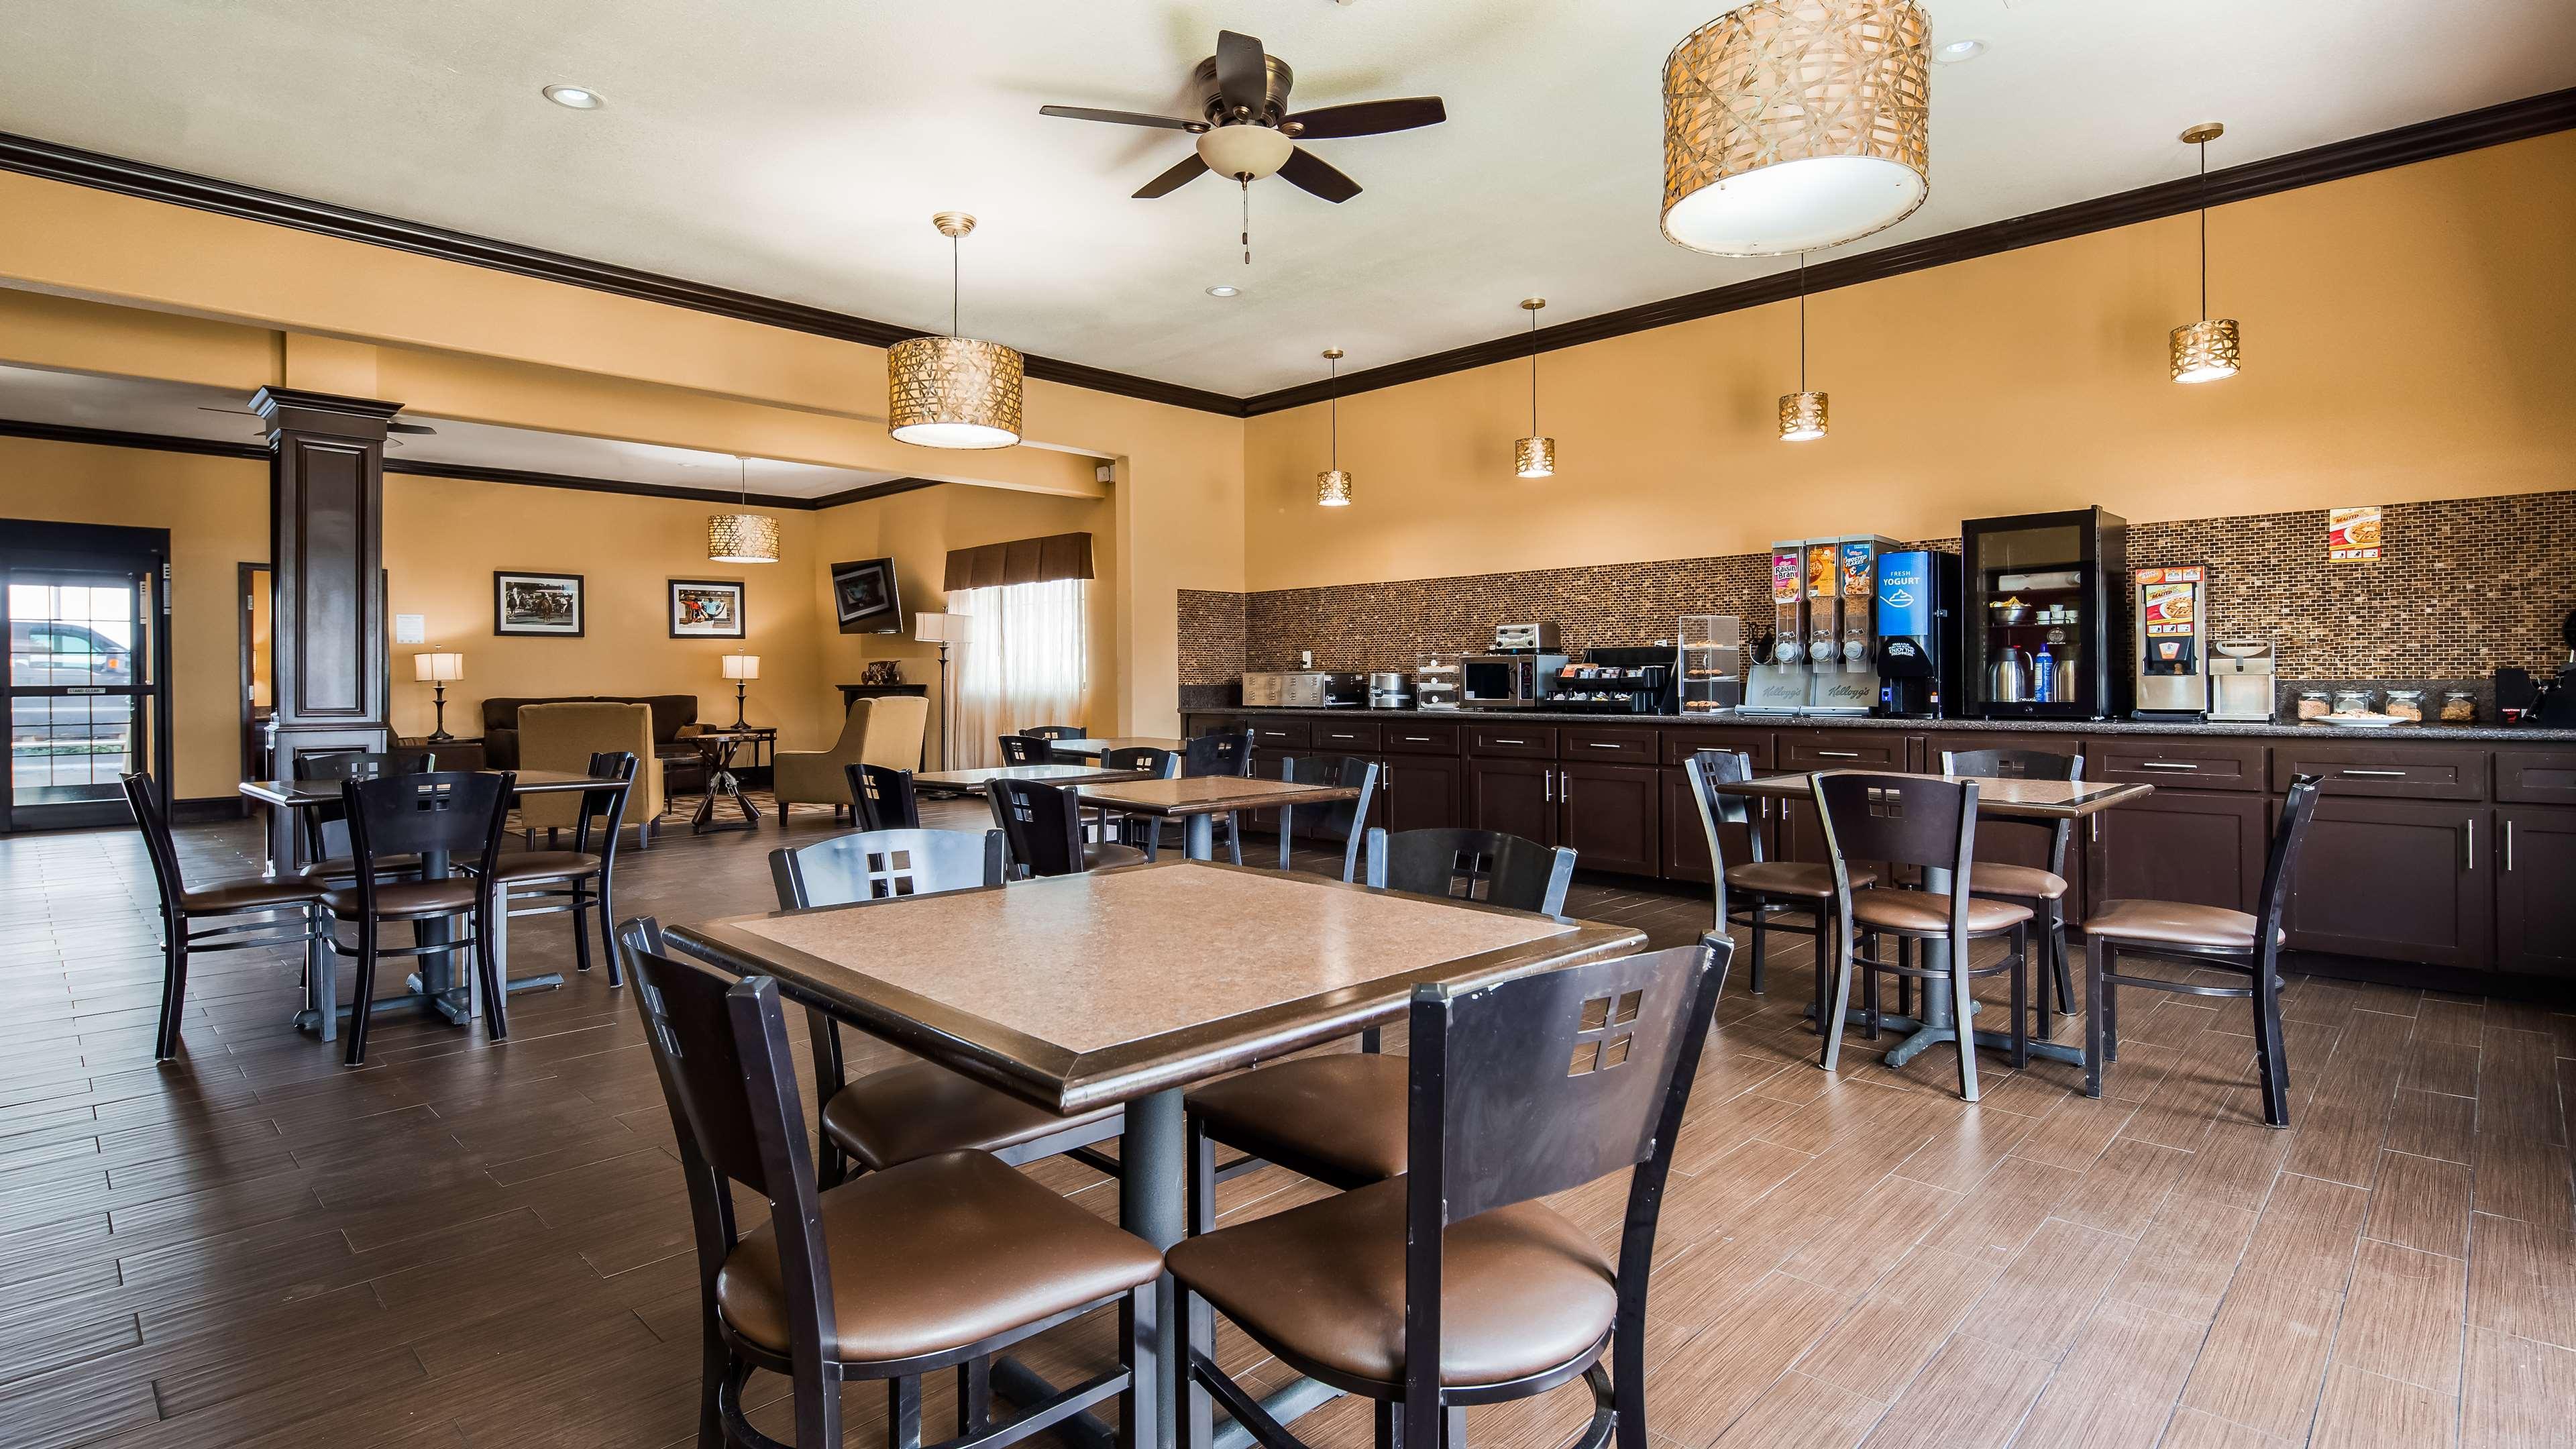 Best Western Trail Dust Inn & Suites image 10